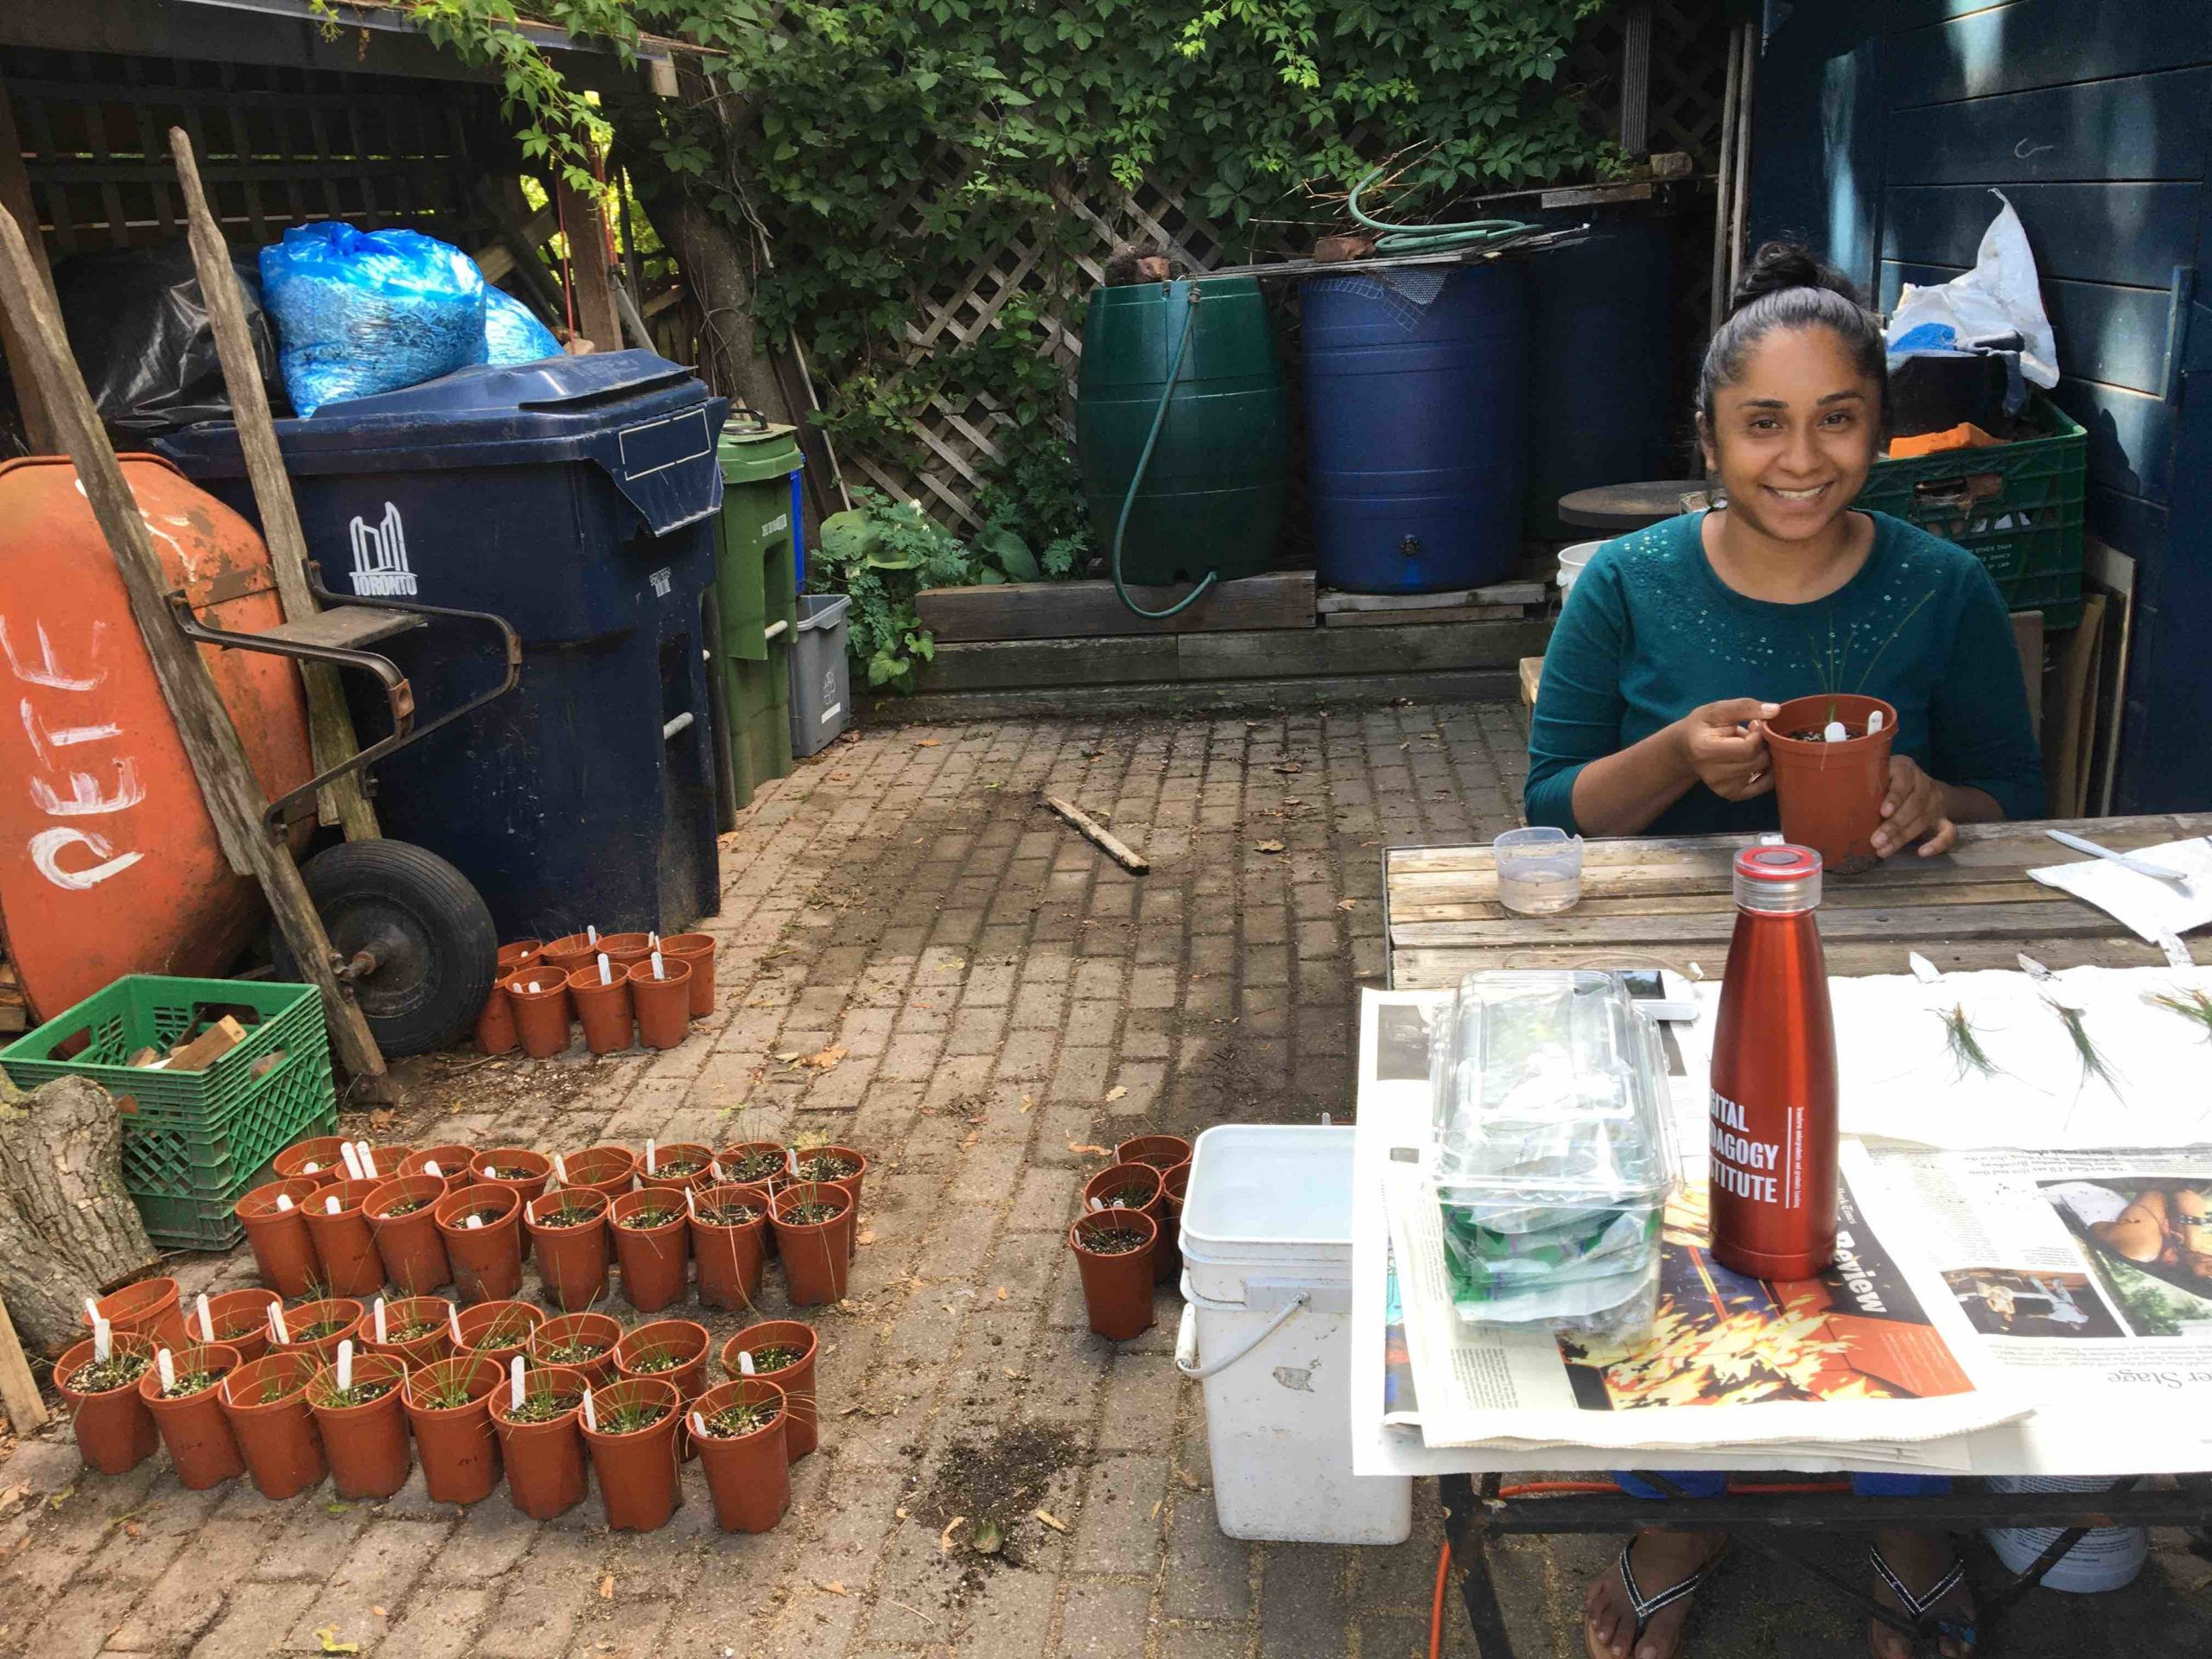 International visiting grad student, Ms. Varsha Boejharat, doing her research in the back garden